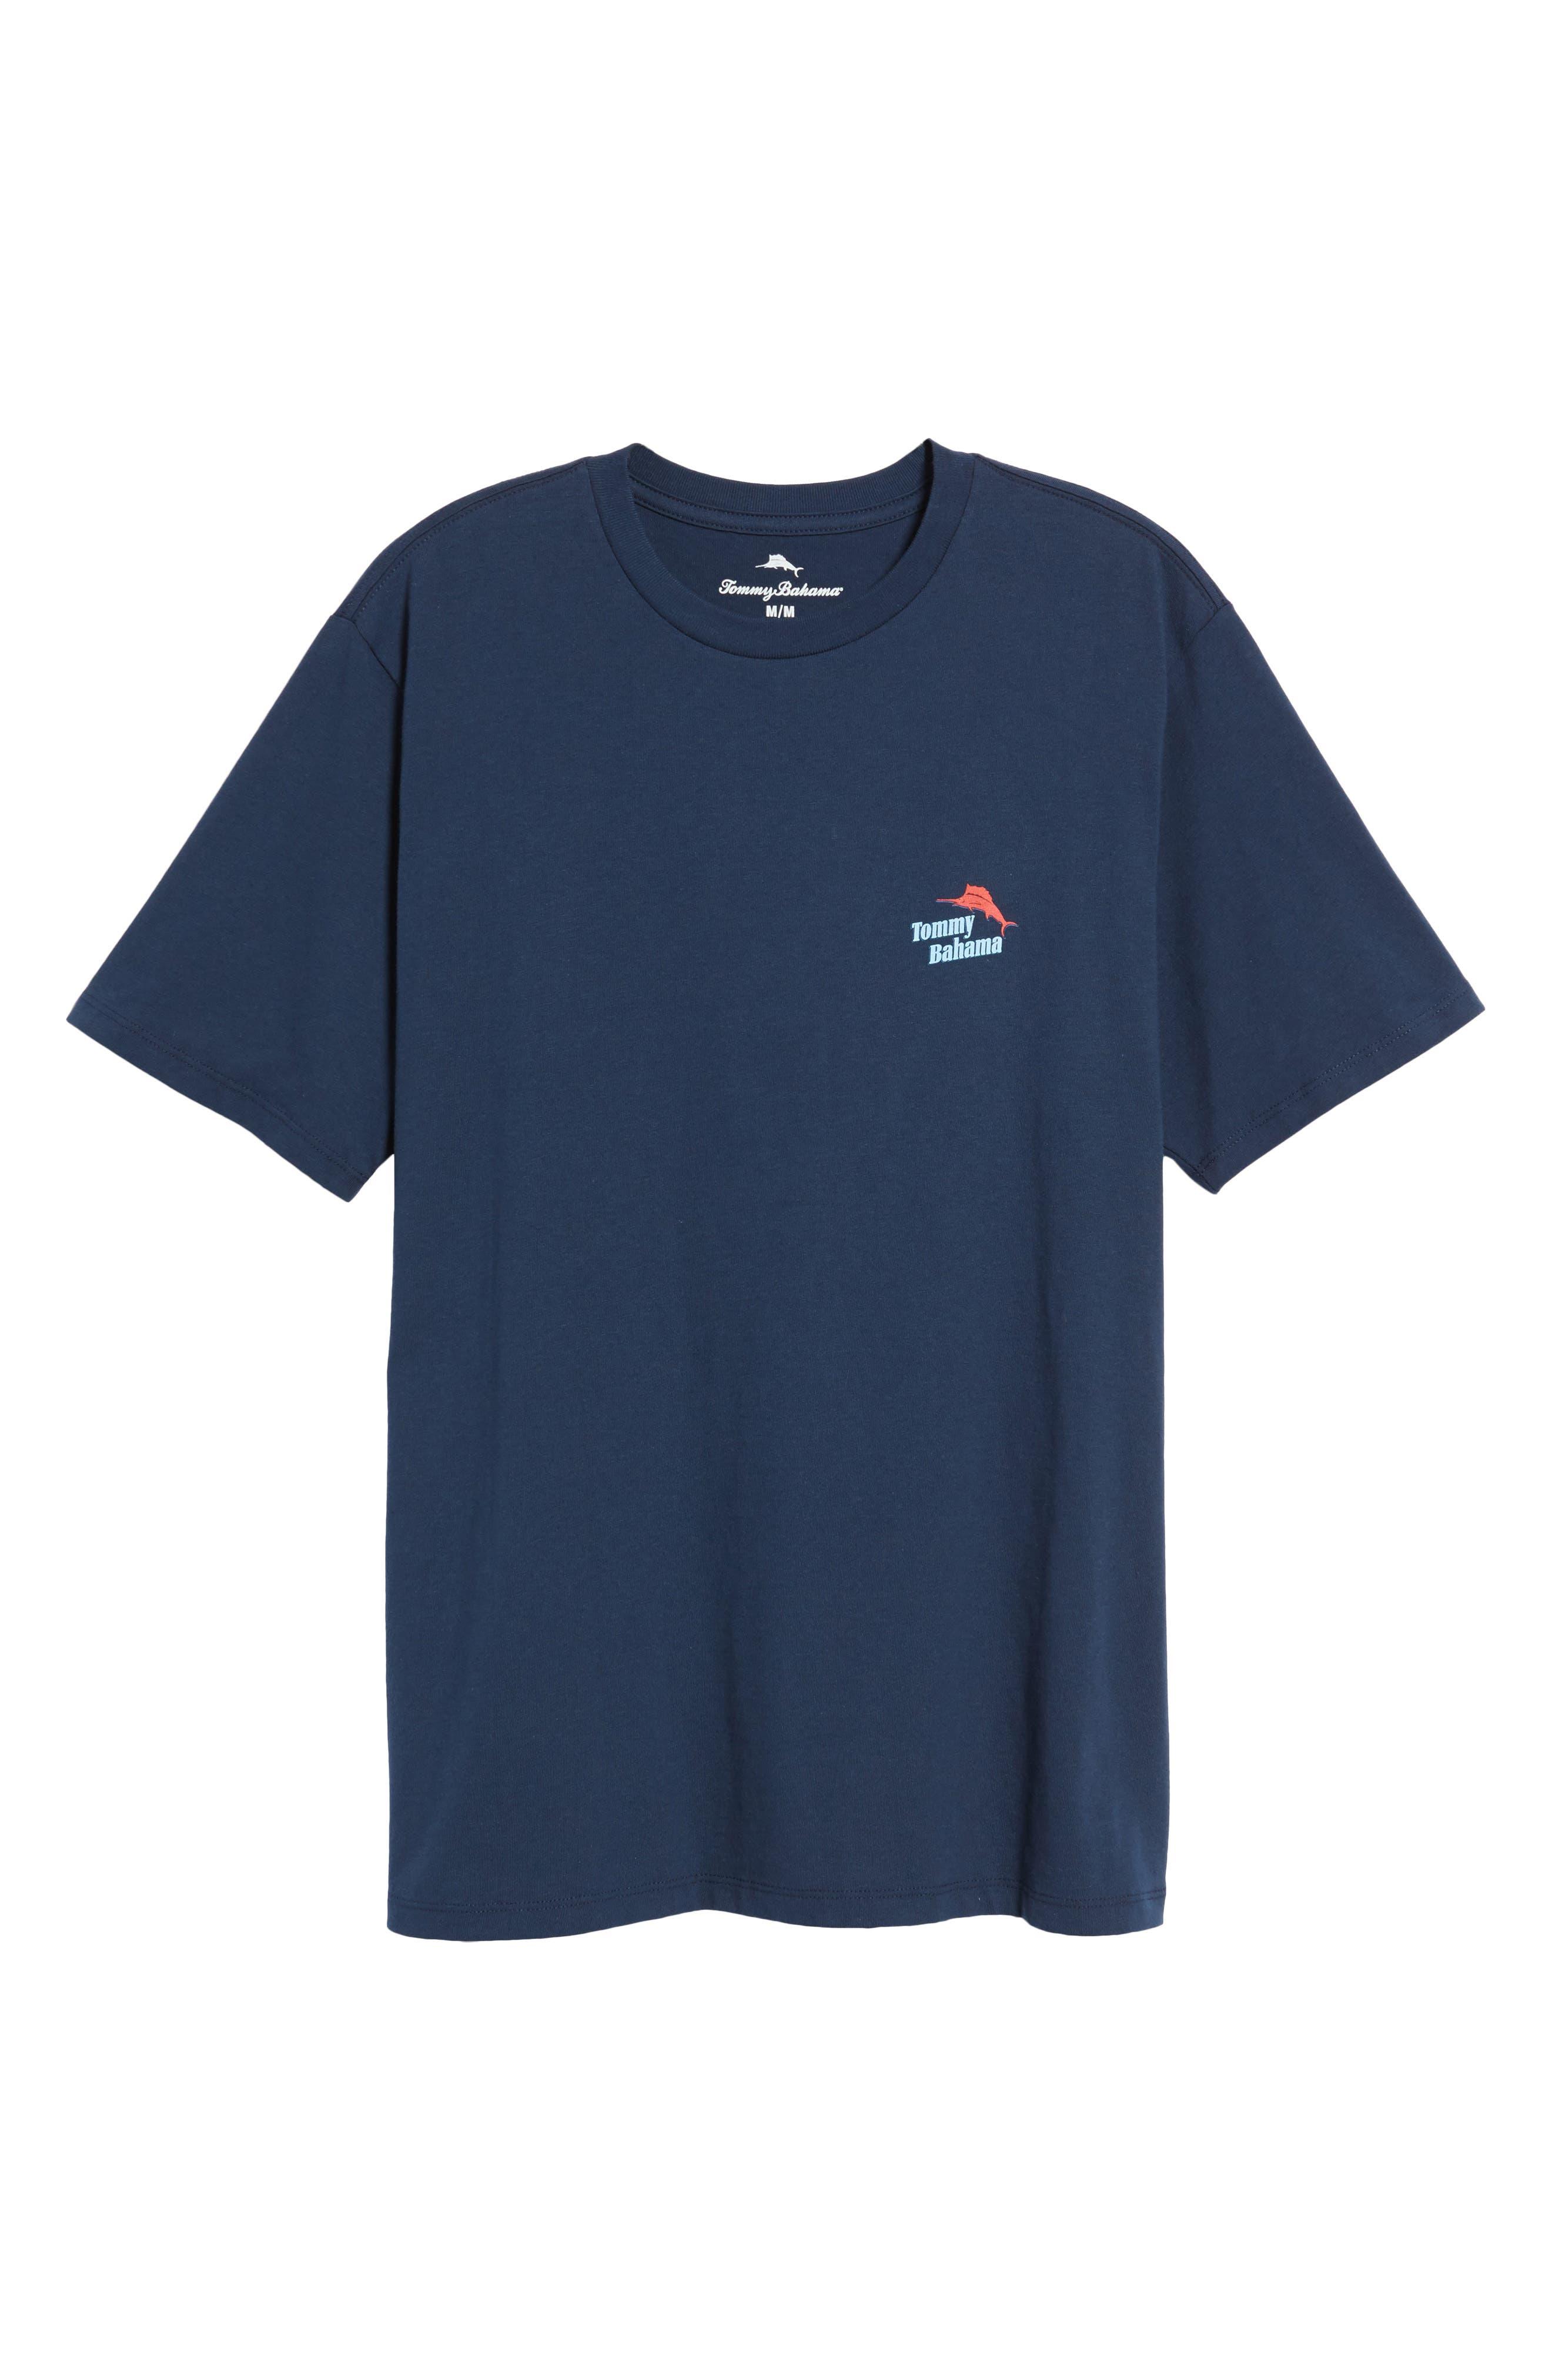 Parrot Sailing T-Shirt,                             Alternate thumbnail 6, color,                             Navy